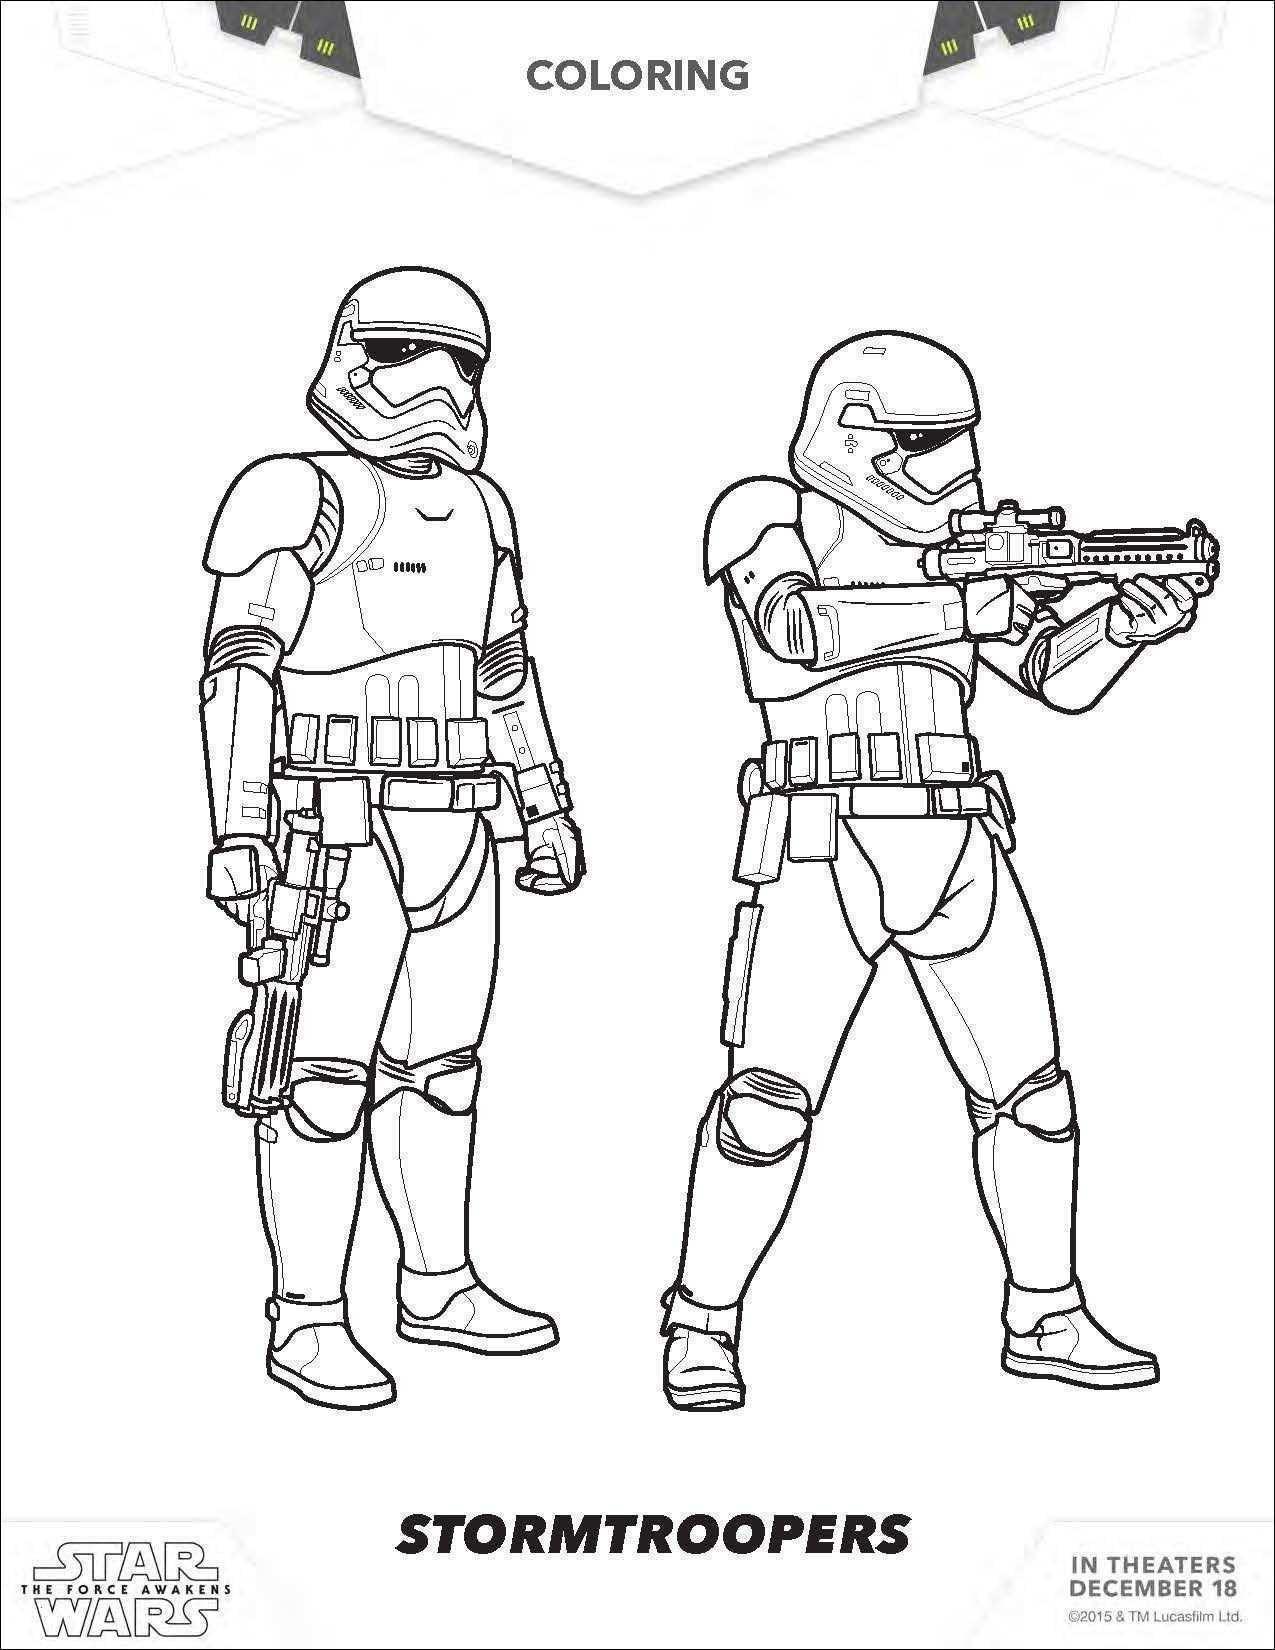 The Walking Dead Ausmalbilder Genial Ausmalbilder Star Wars Lego Bild 32 Lego Starwars Ausmalbilder Sammlung